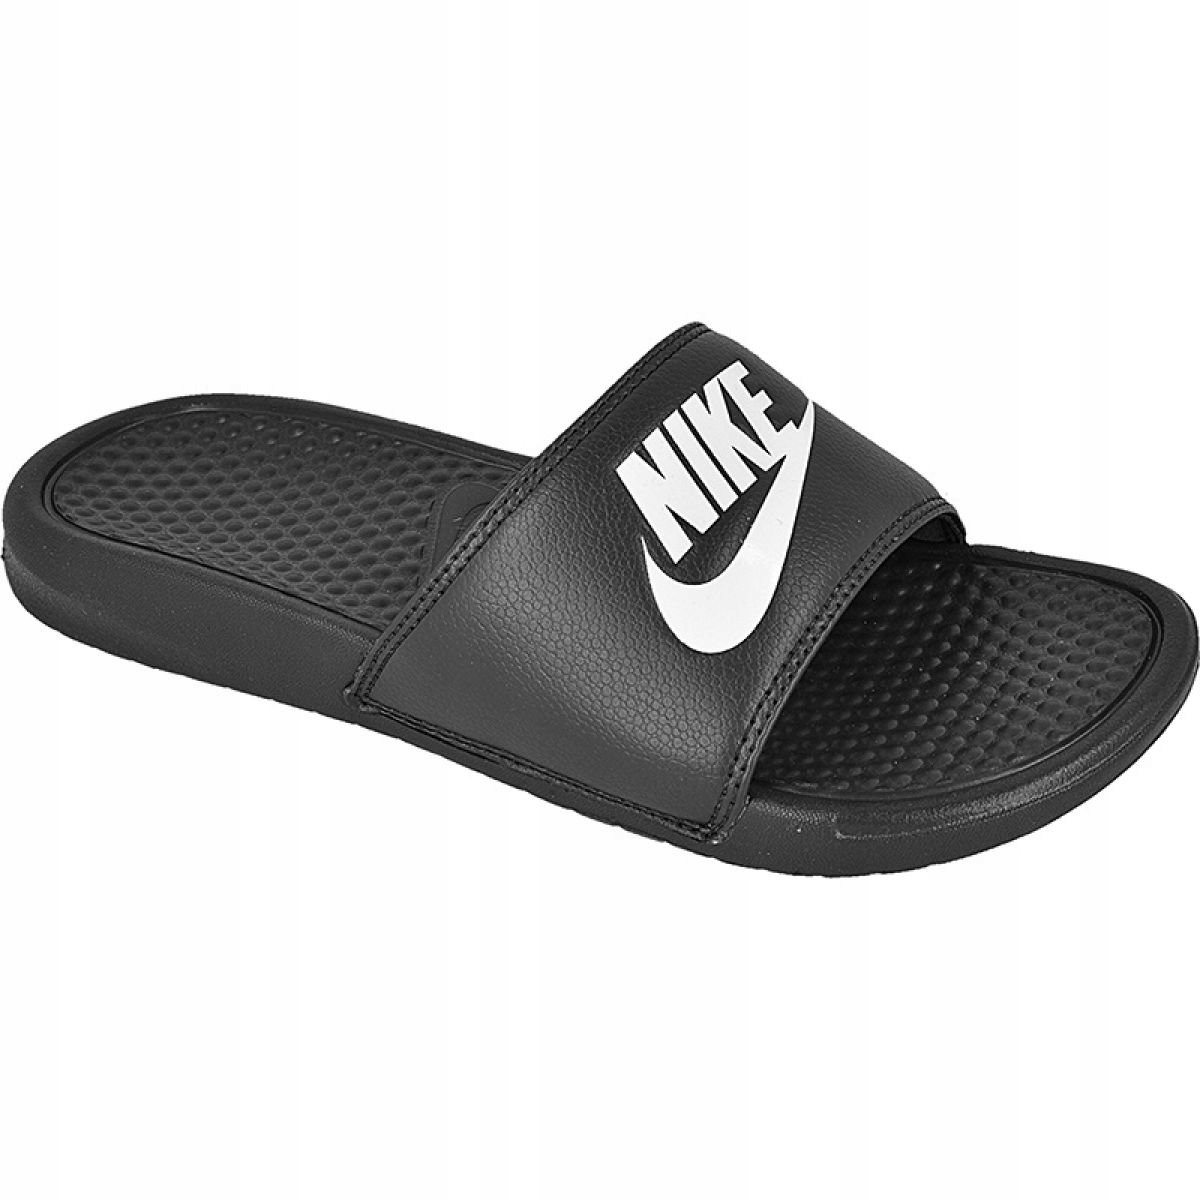 Klapki Nike Sportswear Benassi Jdi M 343880 r.42,5